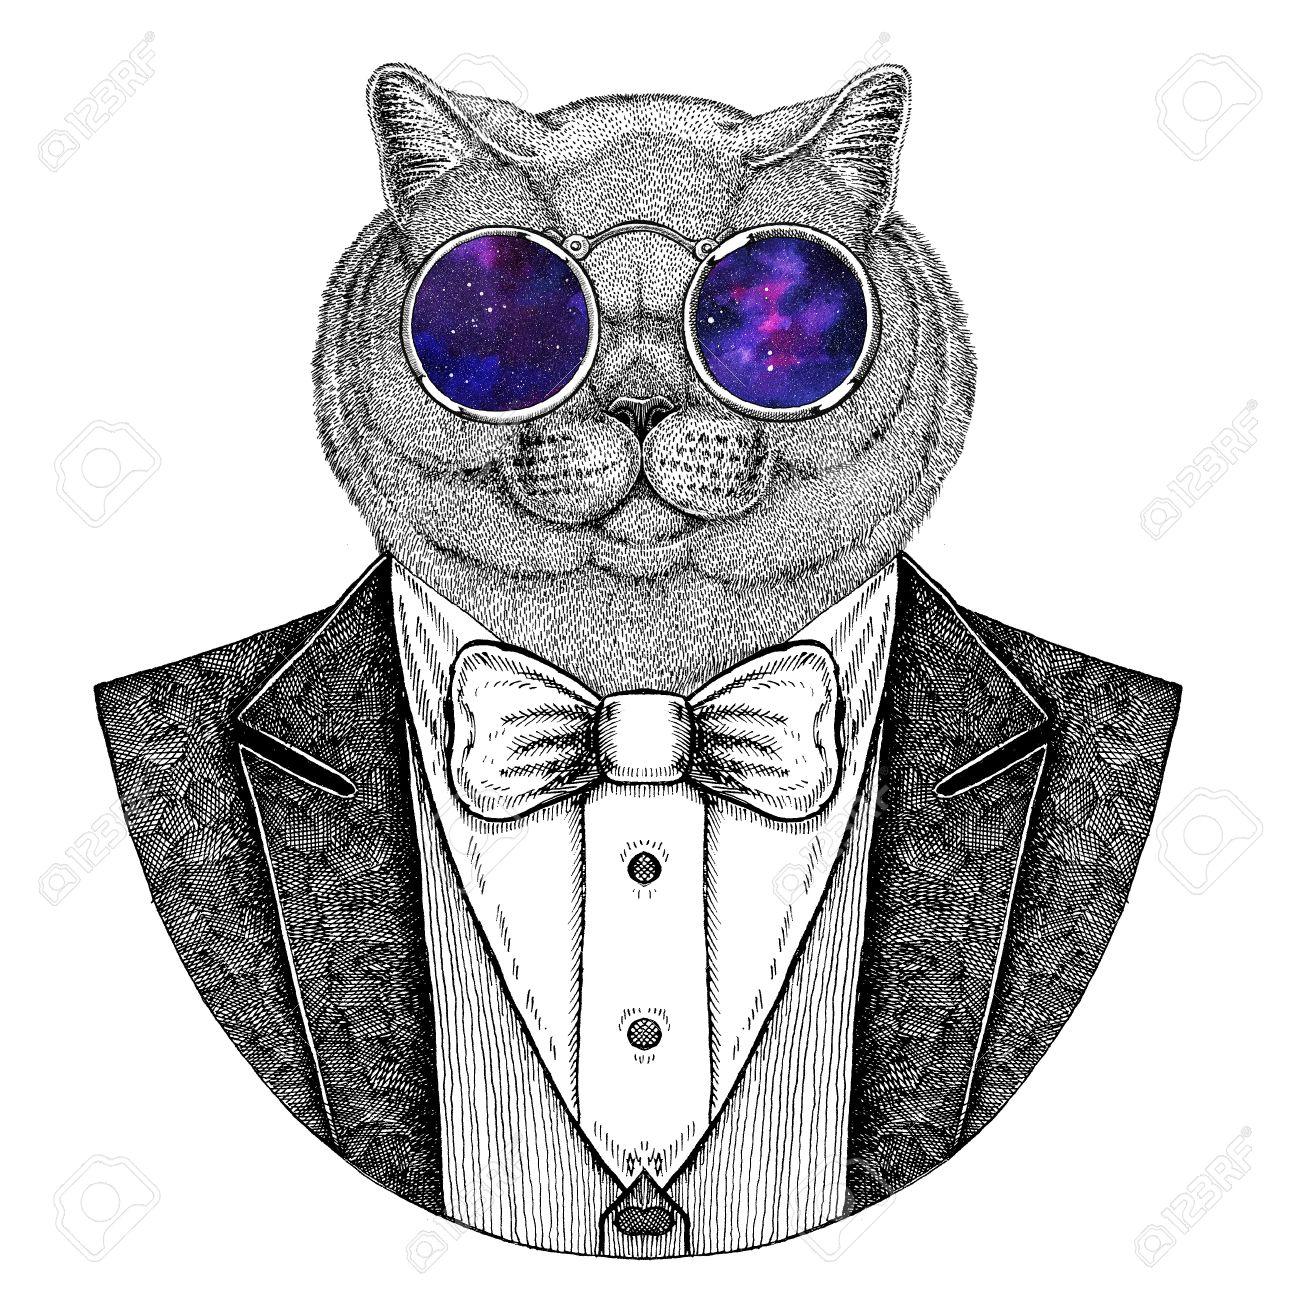 Brithish Noble Cat Hipster Animal Hand Drawn Image For Tattoo Emblem Badge Logo